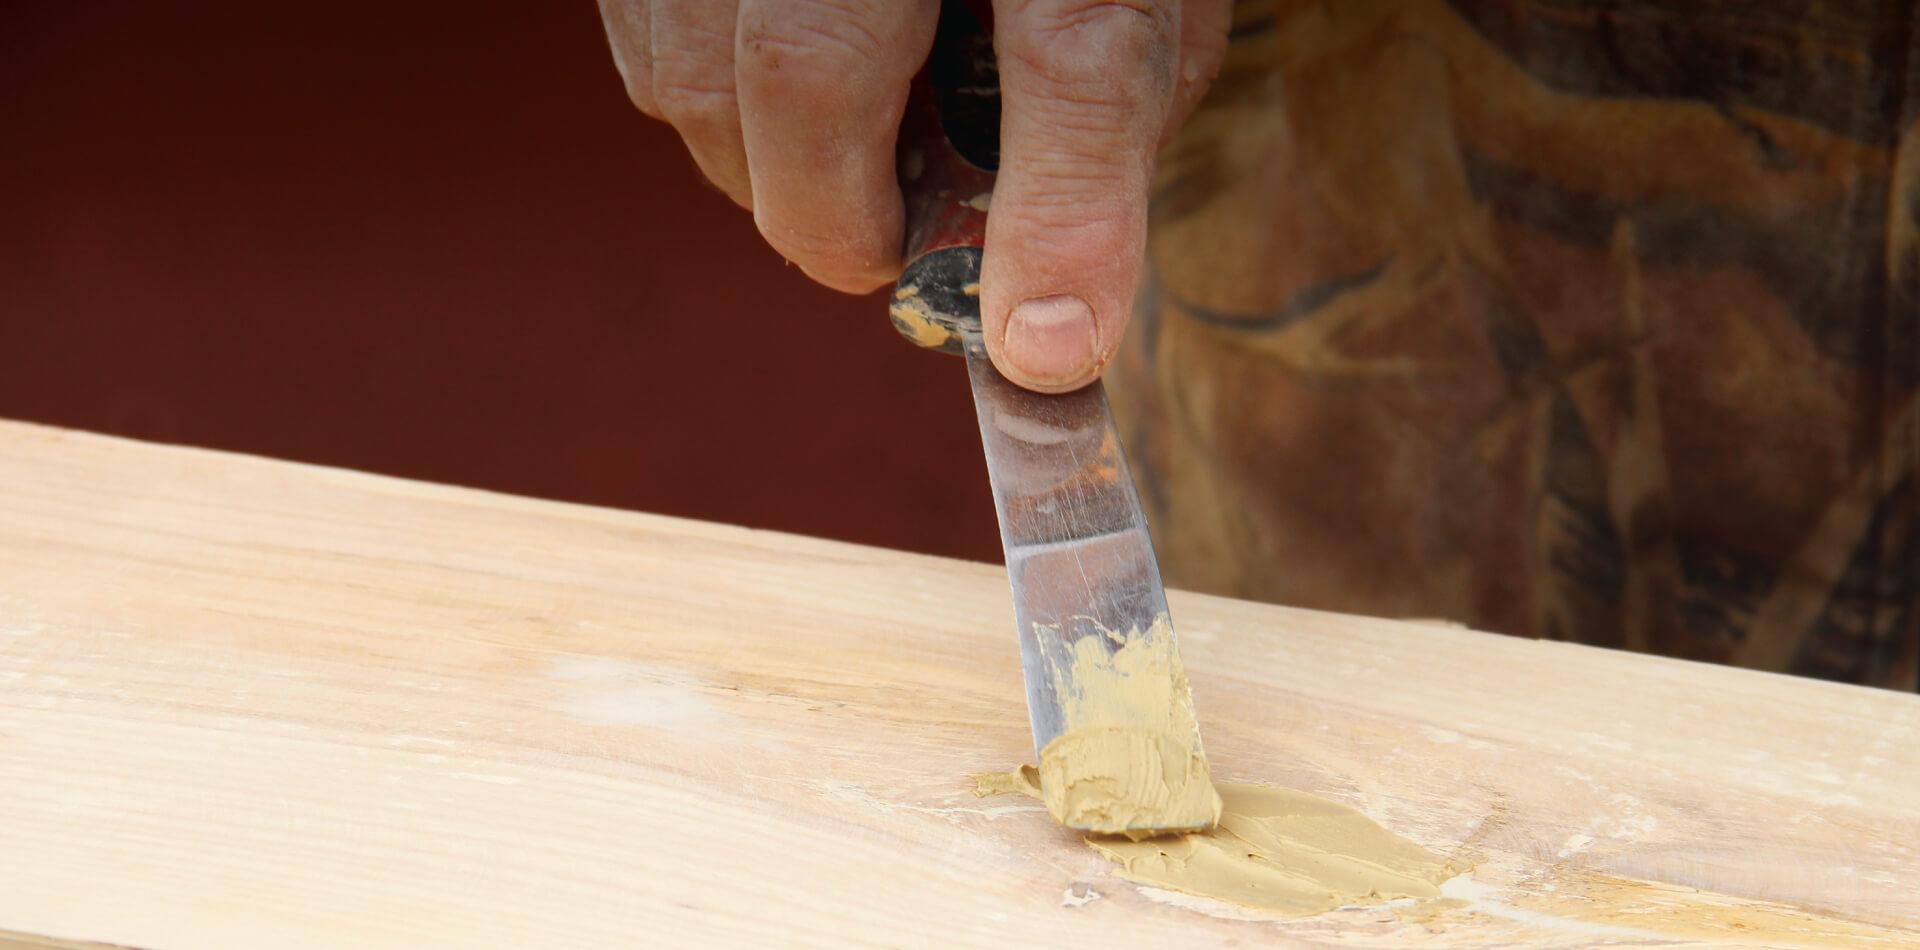 BORMA WACHS premium wood putty